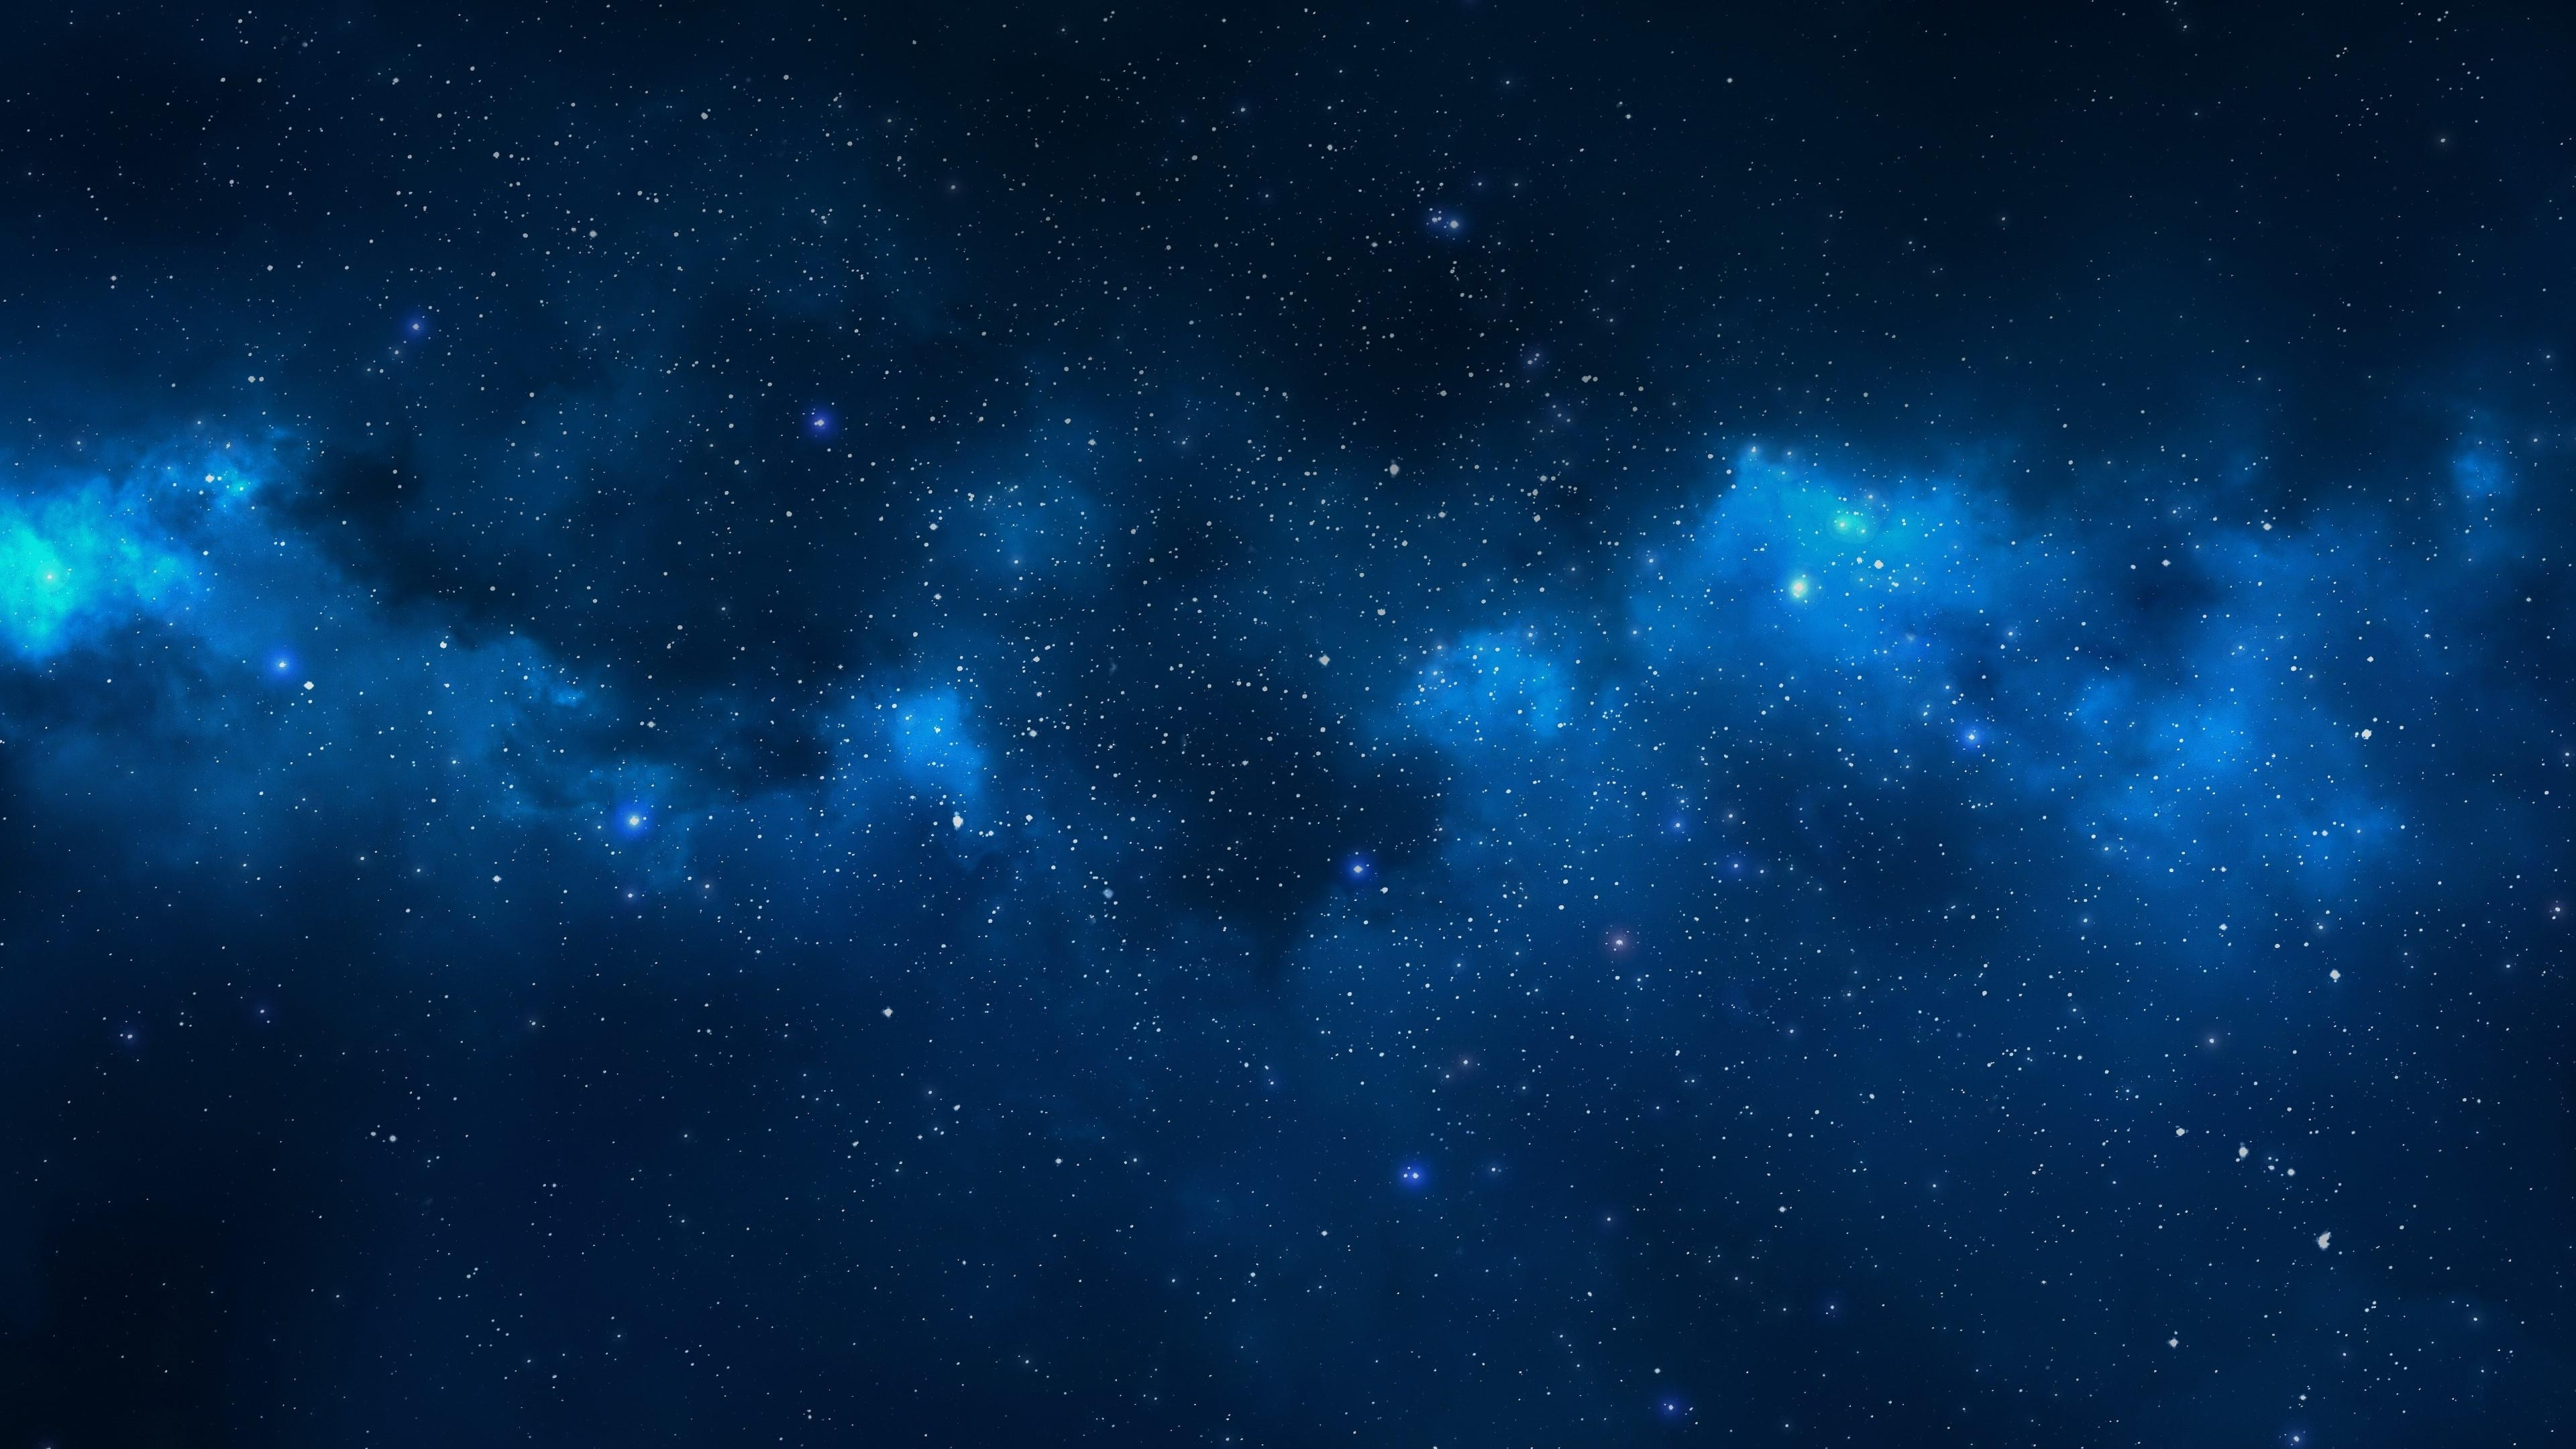 blue nebula wallpaper | wallpaper studio 10 | tens of thousands hd